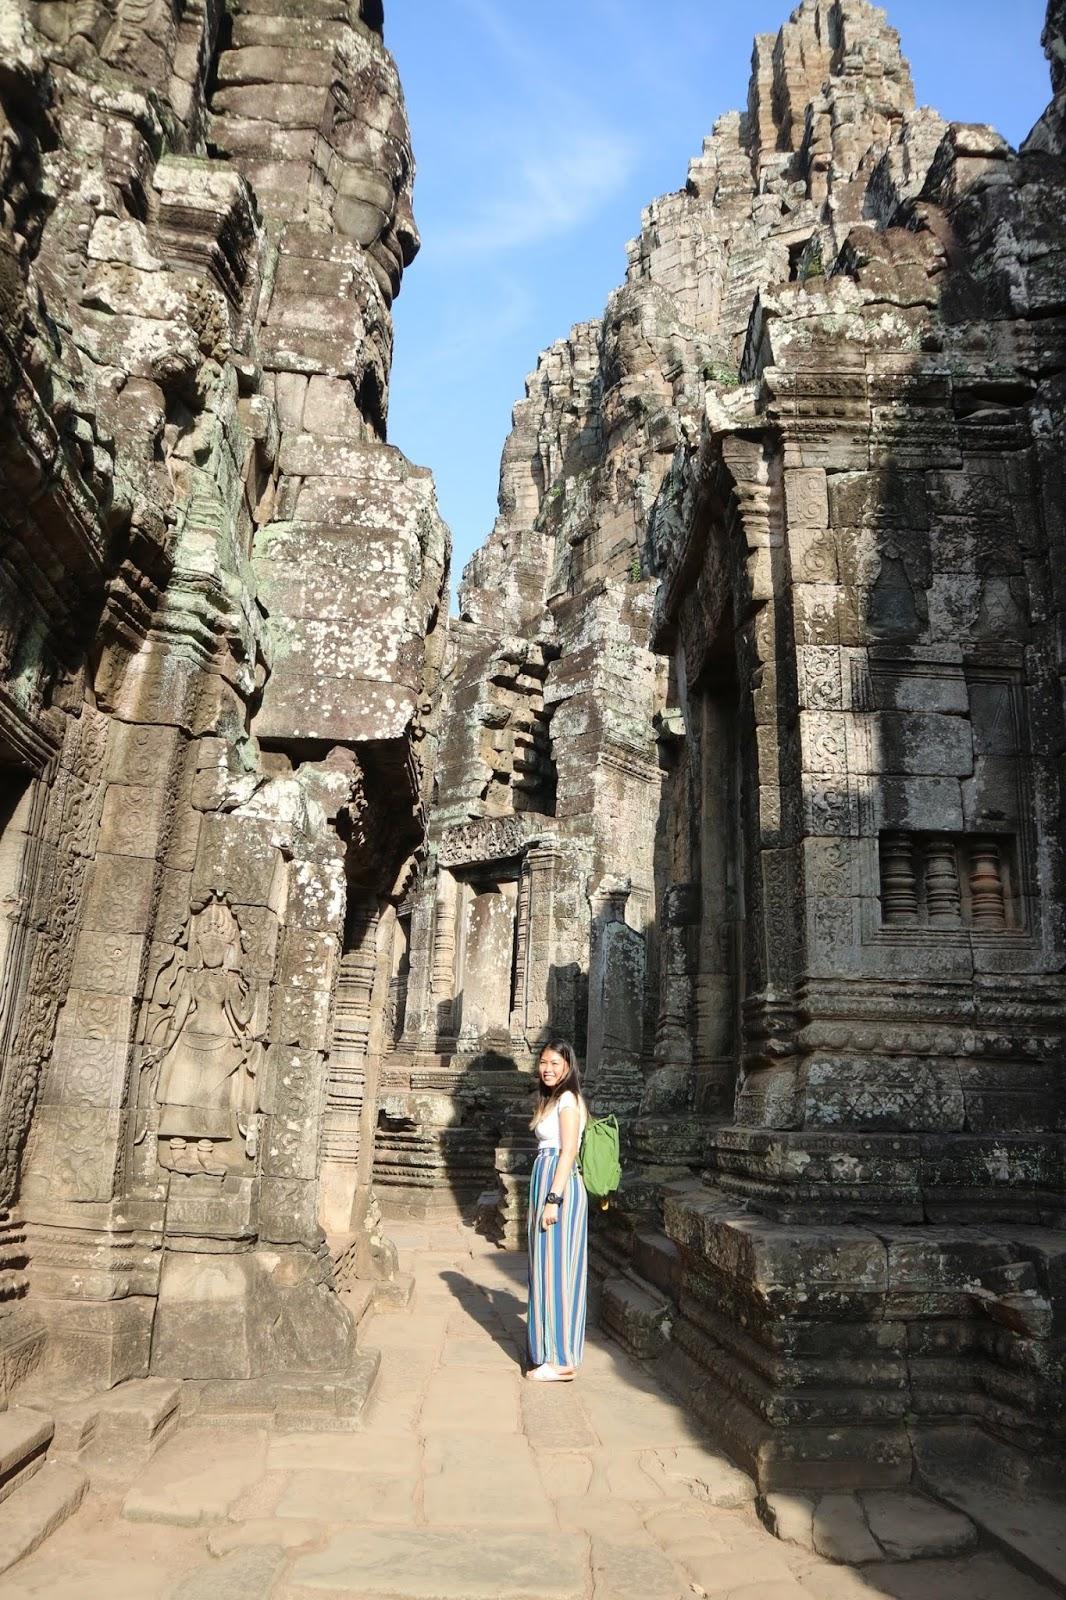 Exploring the ruins of Bayon Temple